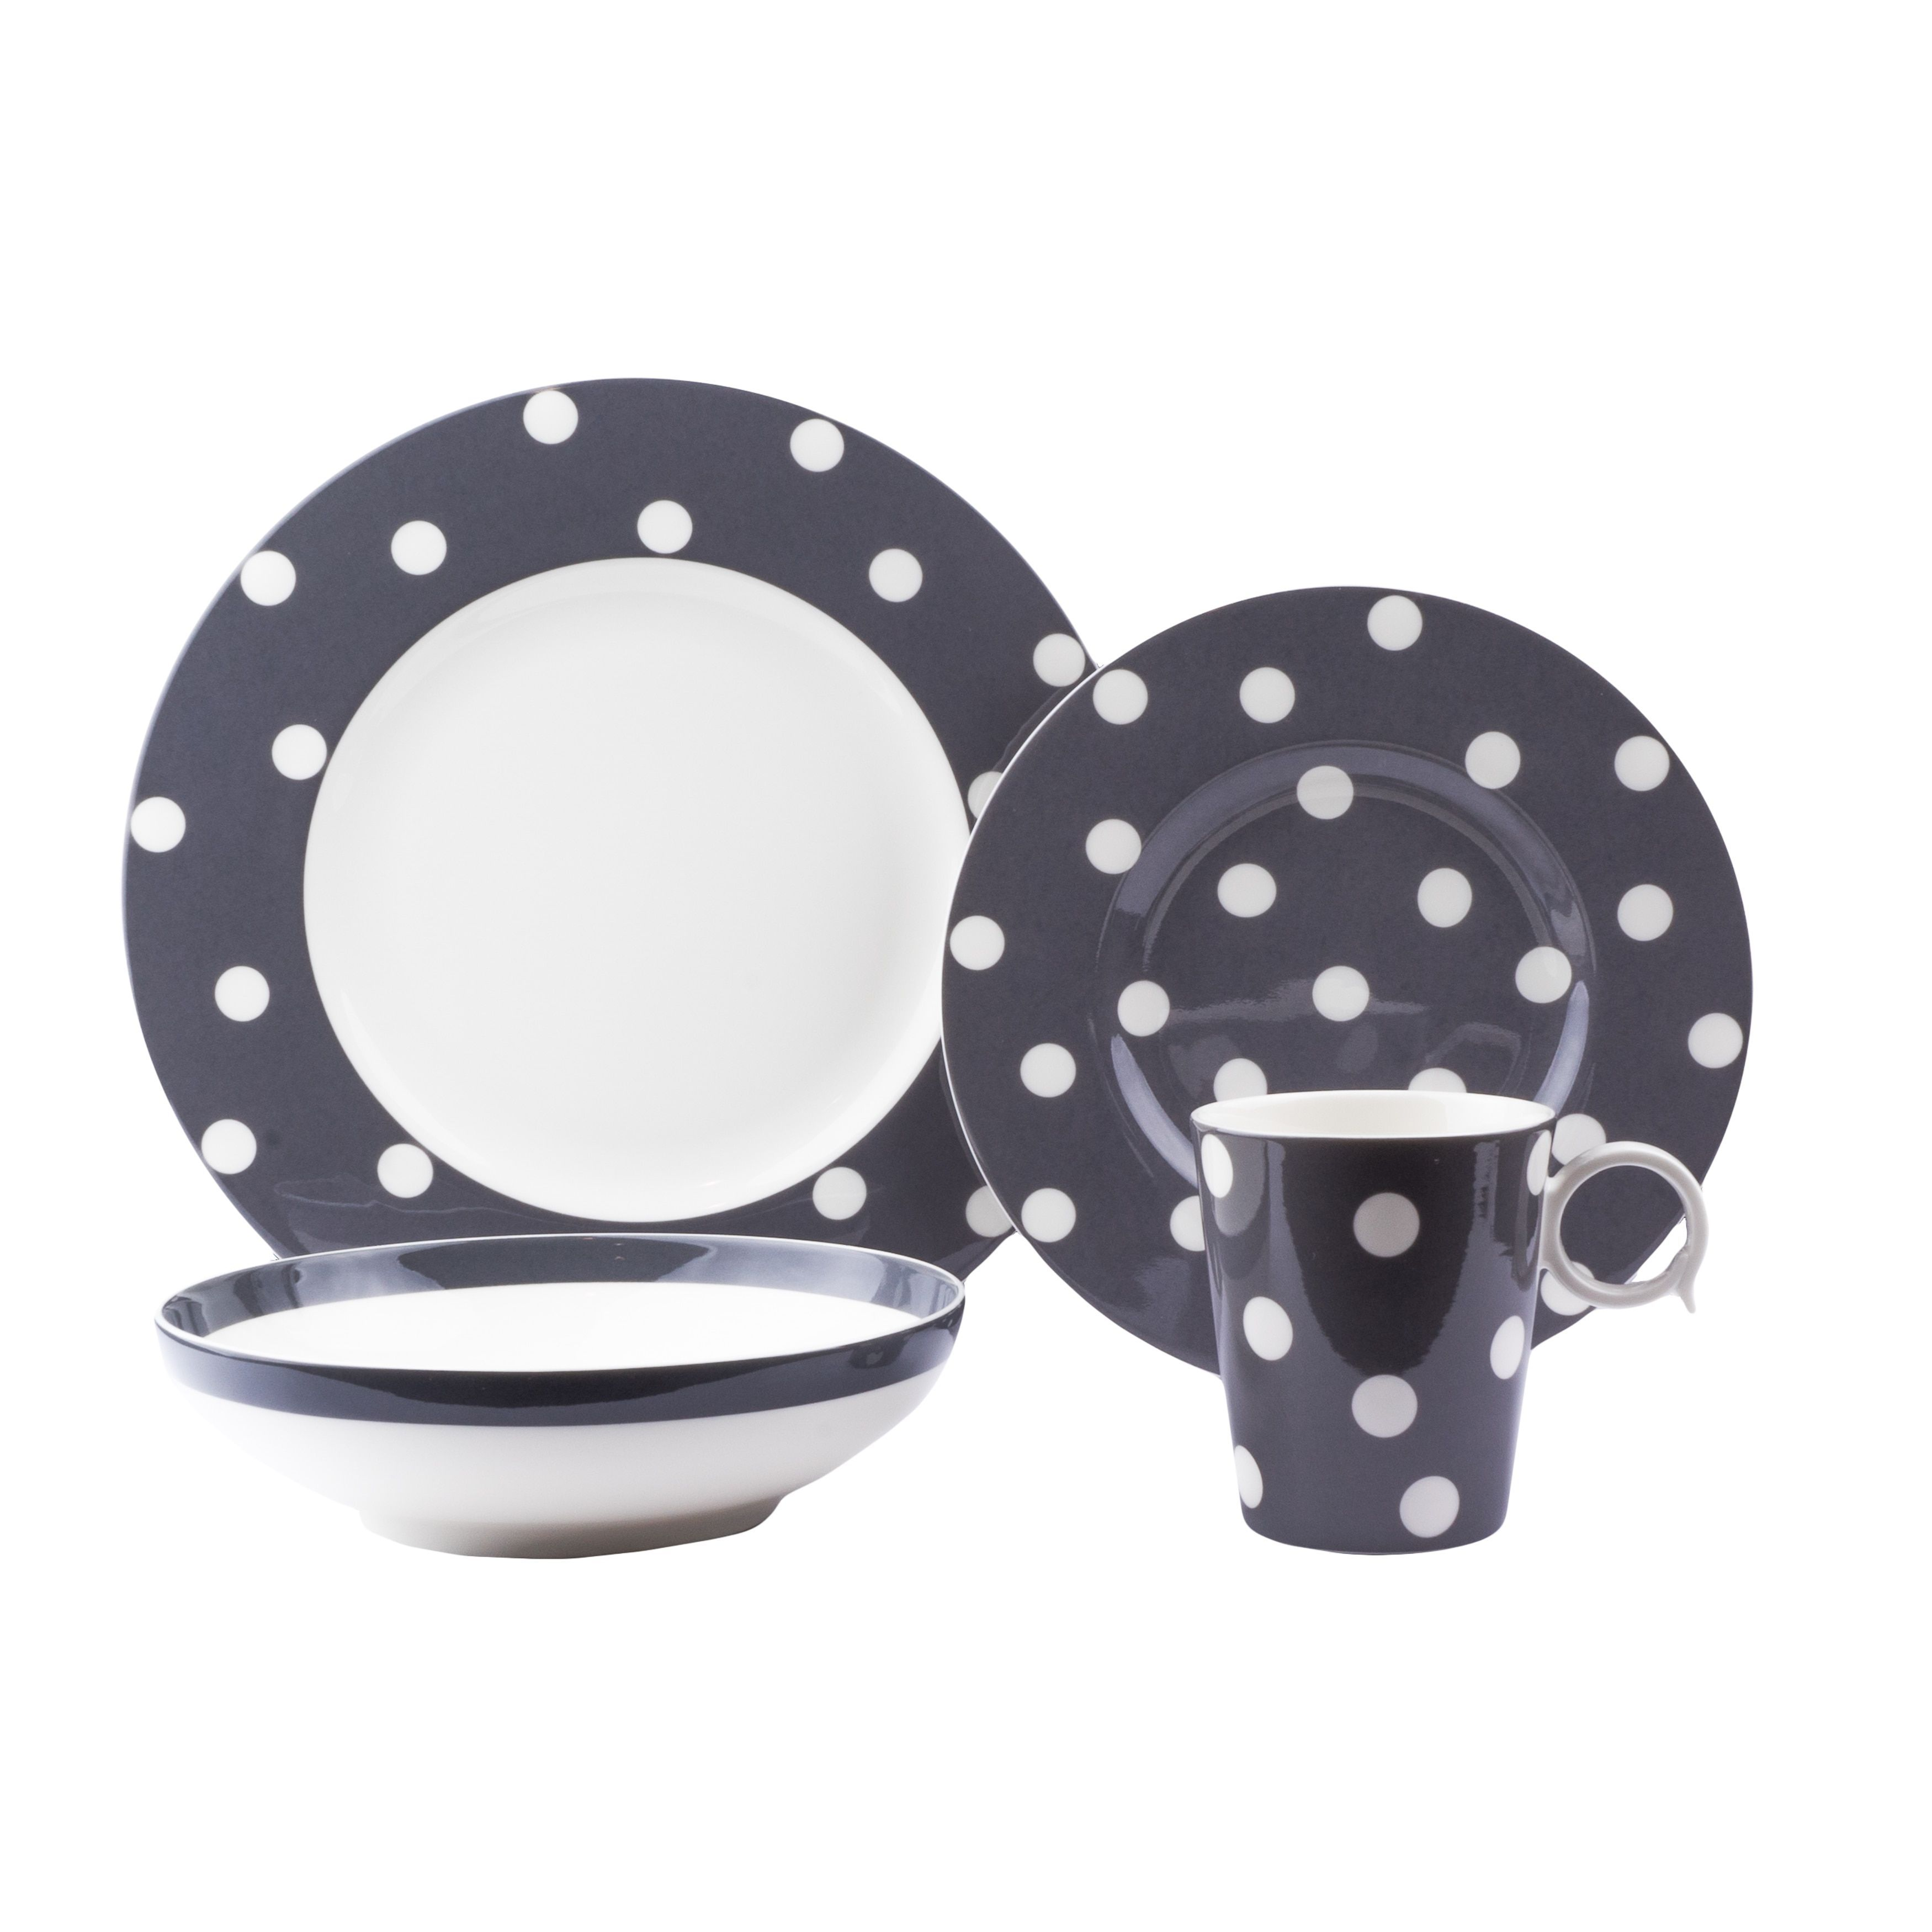 Red Vanilla Freshness Dots Grey Porcelain 16-piece Dinner Set (Red Vanilla Freshness Dots Grey 16Pc Dinner set)